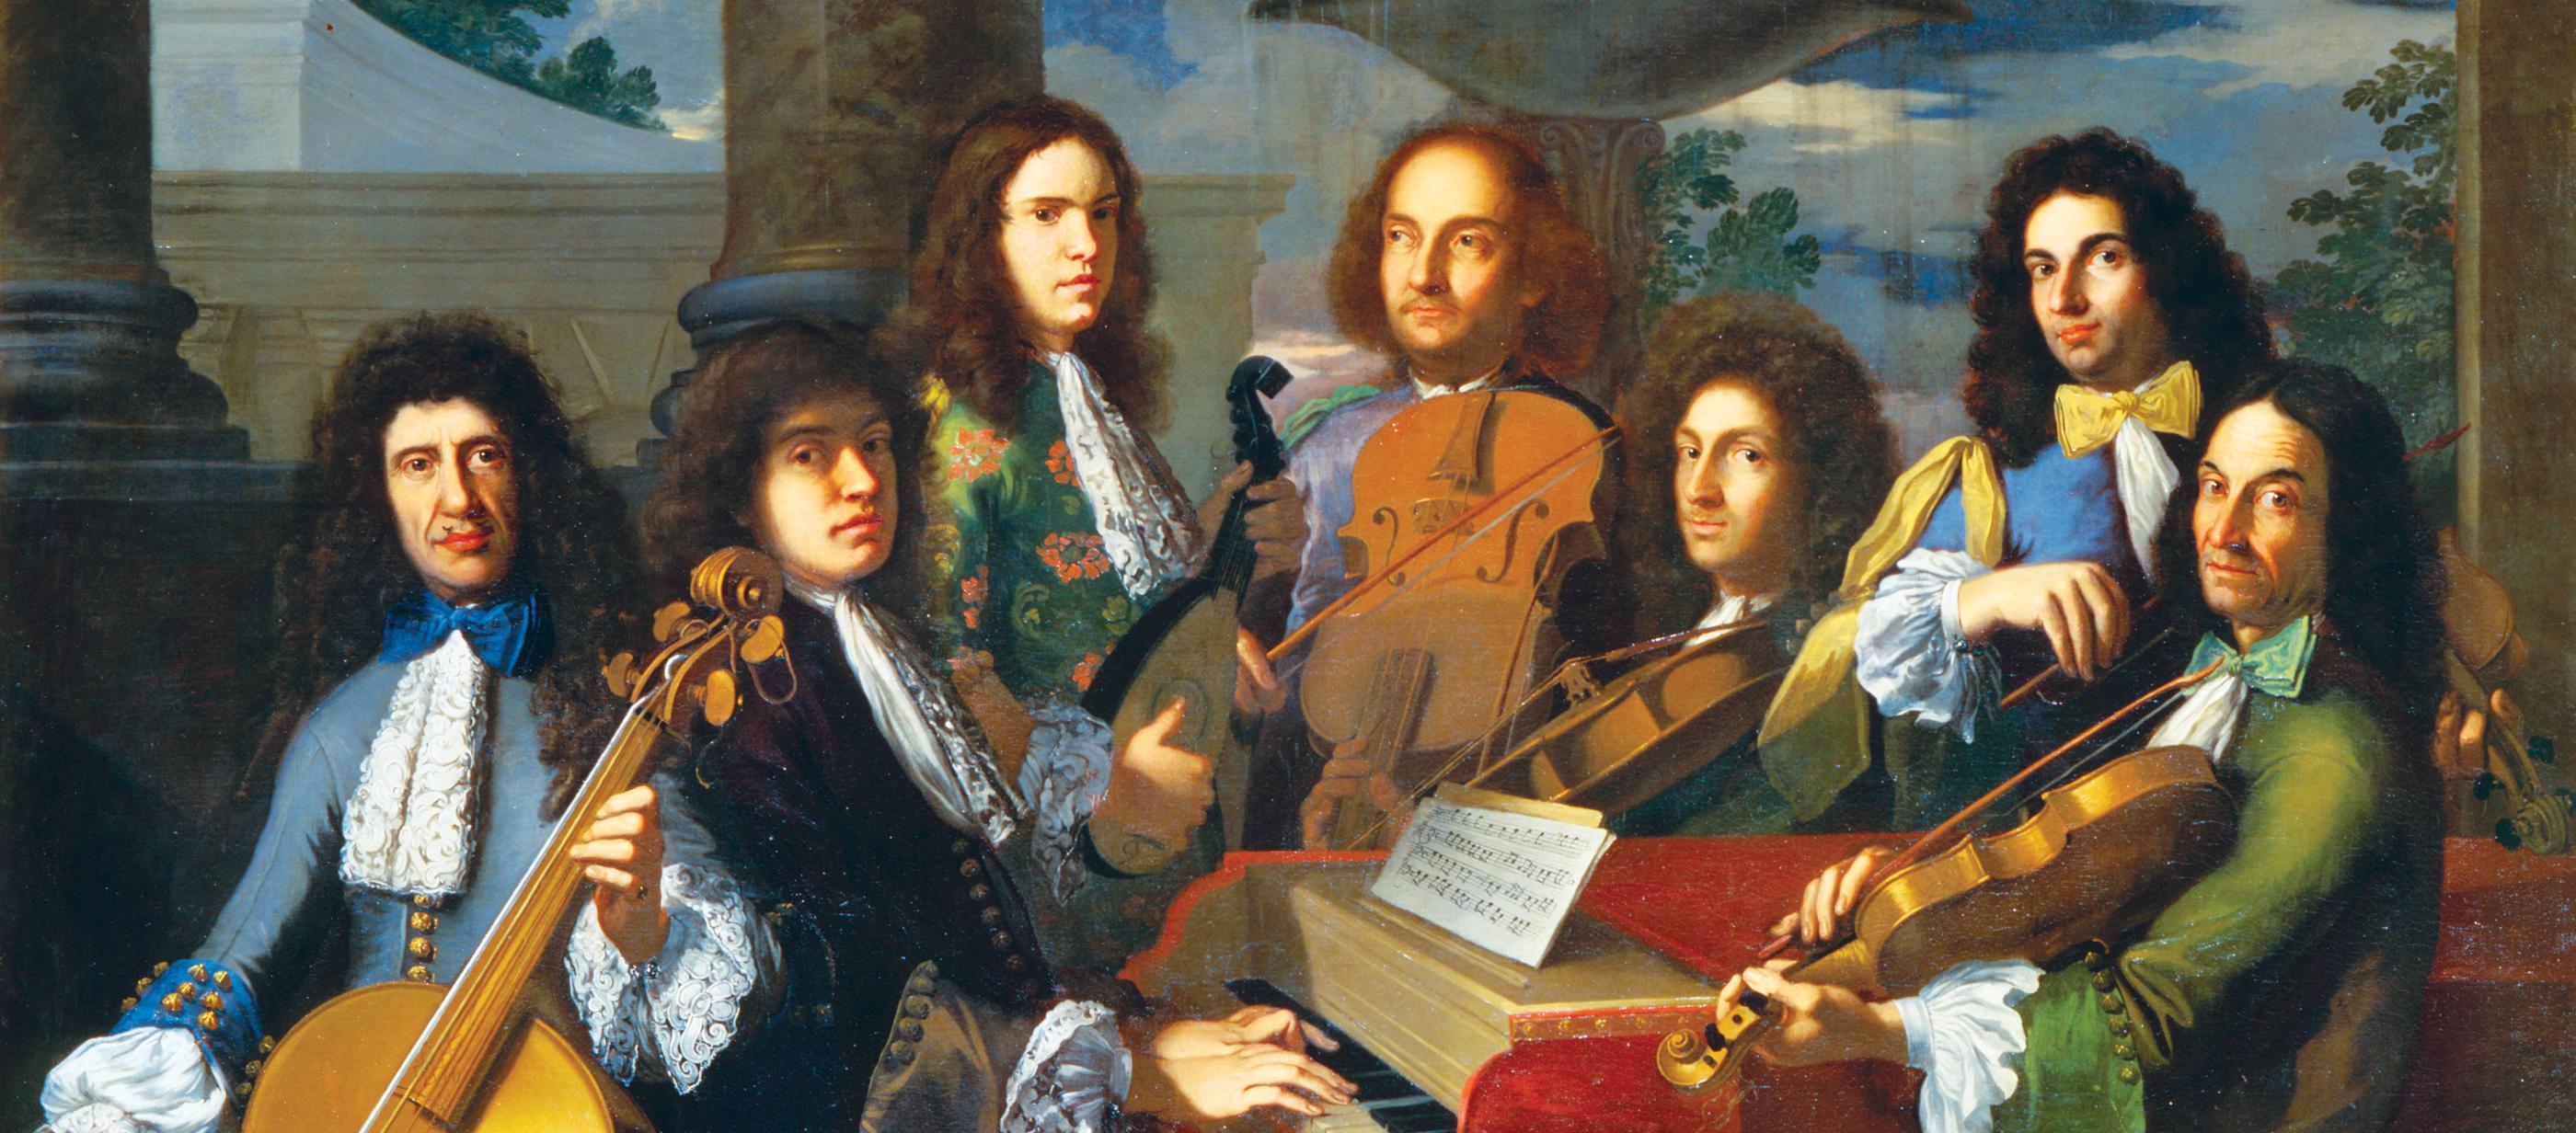 """Músicos na corte dos Medici"" de Antonio Domenico Gabbiani (1652-1726). Palazzo Pitti, Florença (Itália)."